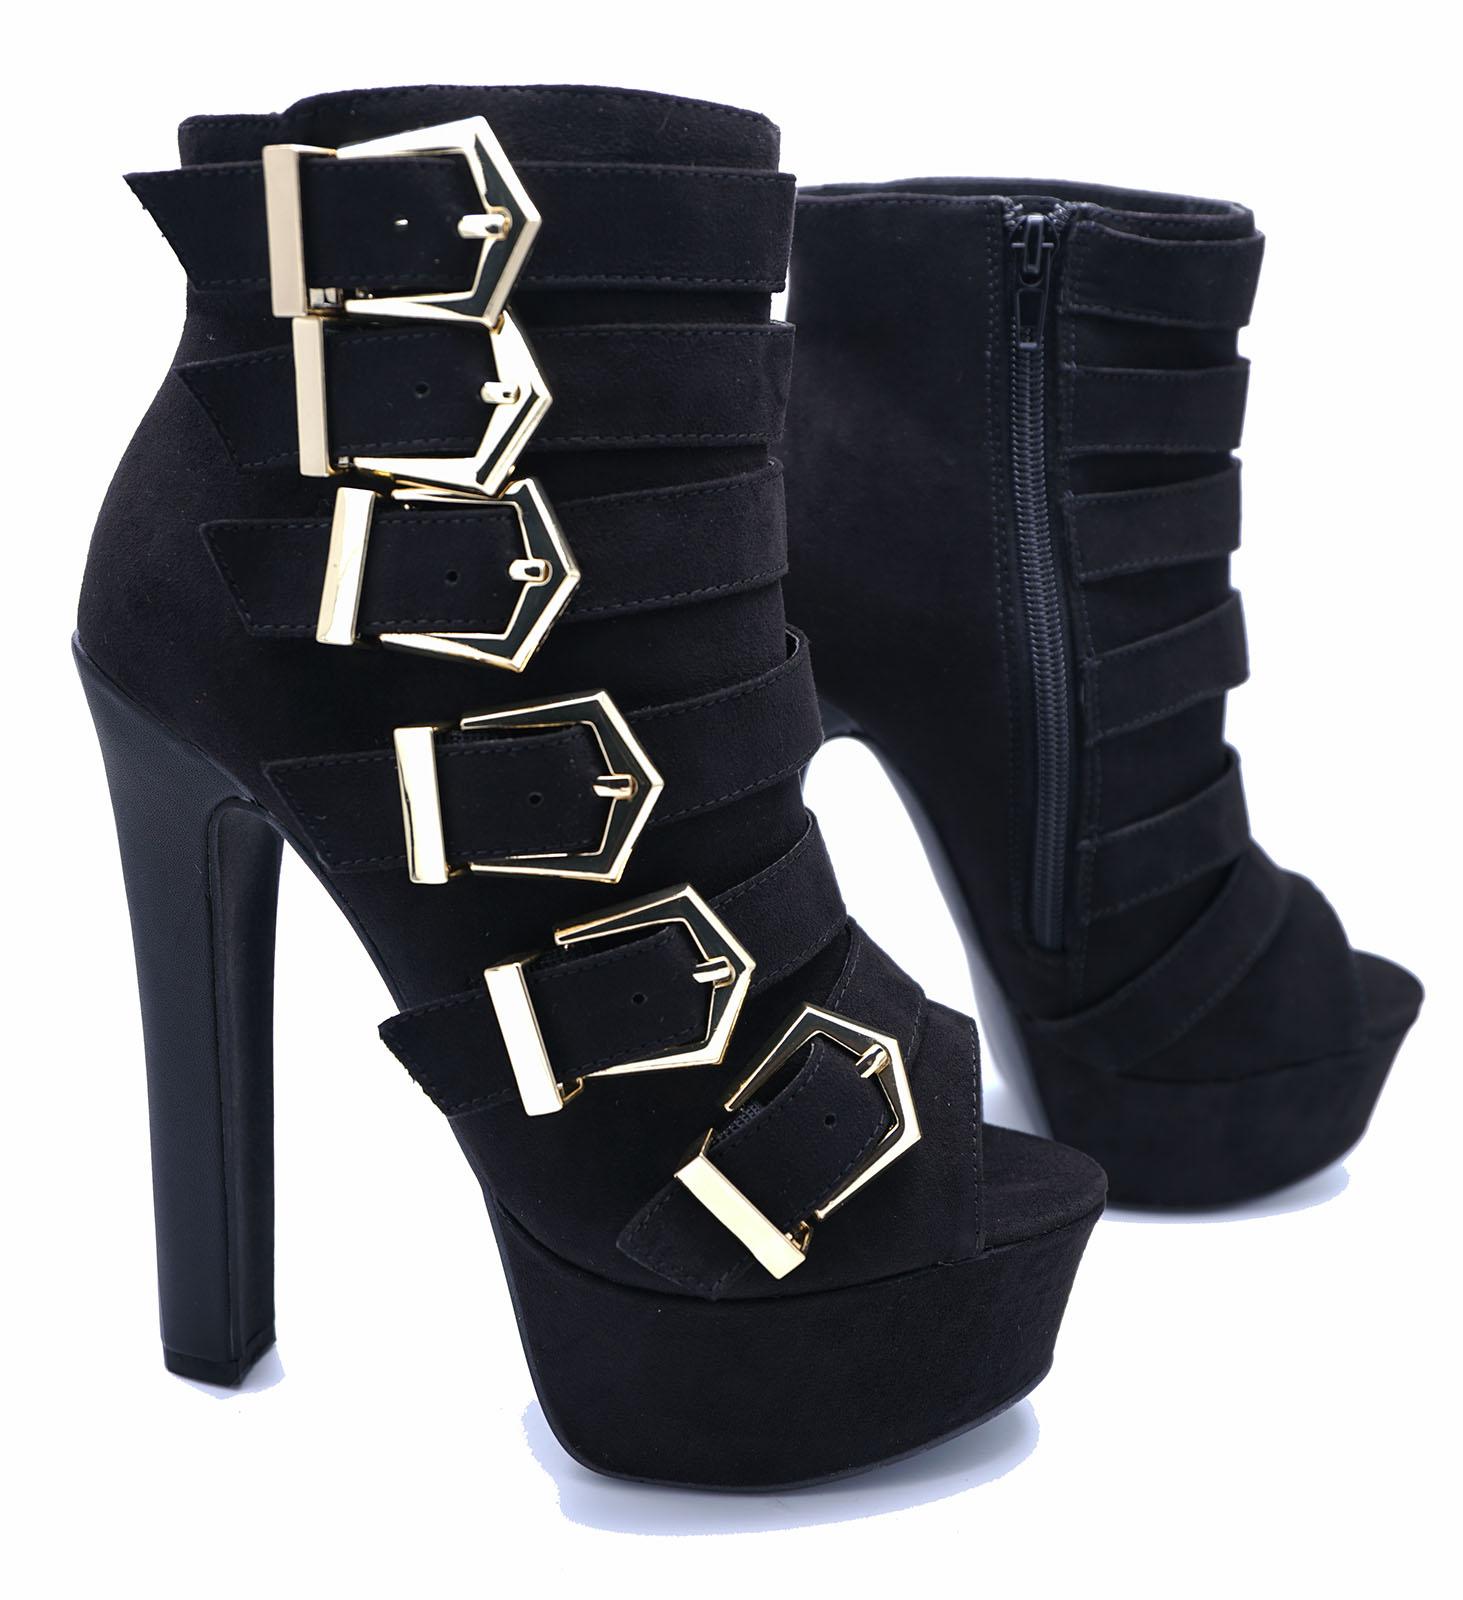 LADIES-BLACK-ZIP-UP-PLATFORM-PEEP-TOE-BUCKLE-ANKLE-CALF-HIGH-HEEL-BOOTS-SIZES-3 thumbnail 37